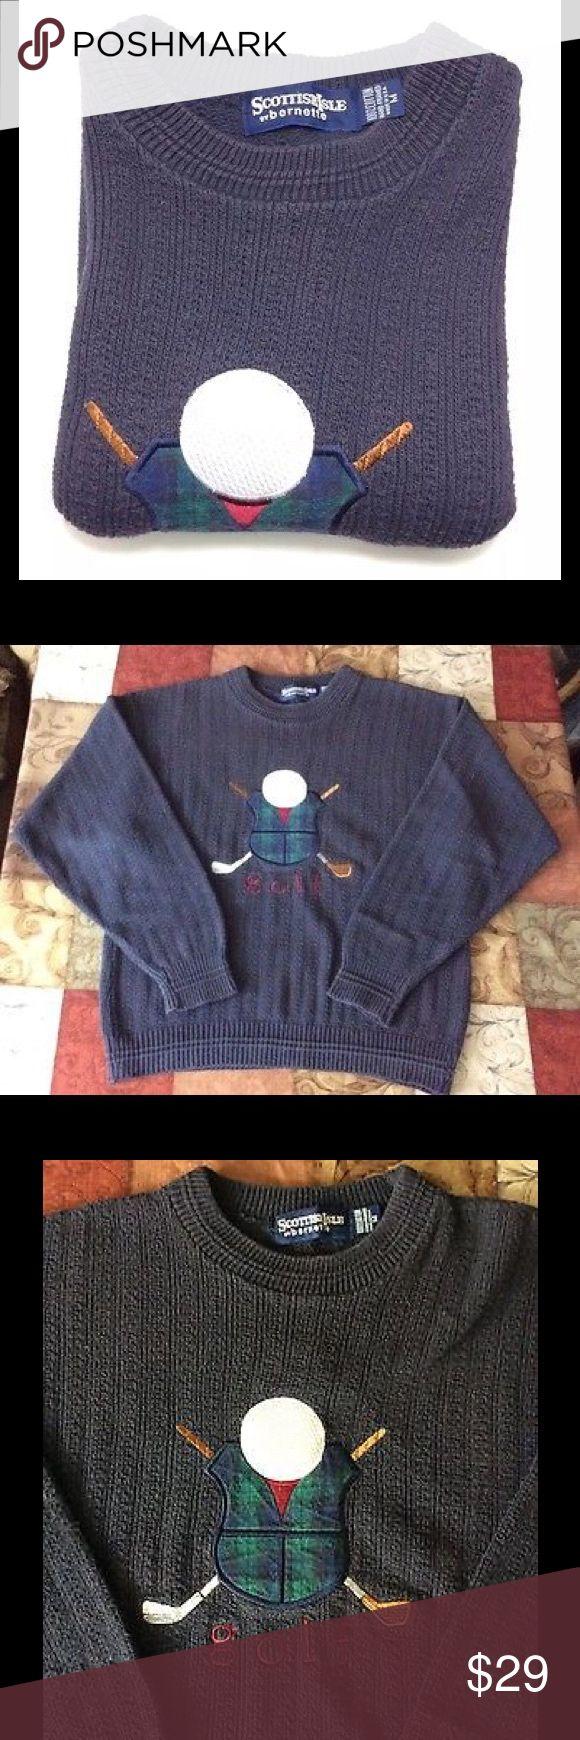 Scottish Isle Vintage GOLF Sweater Medium Crewneck Scottish Isle Vintage GOLF Sweater Medium Crewneck. scottish Isle Sweaters Crewneck